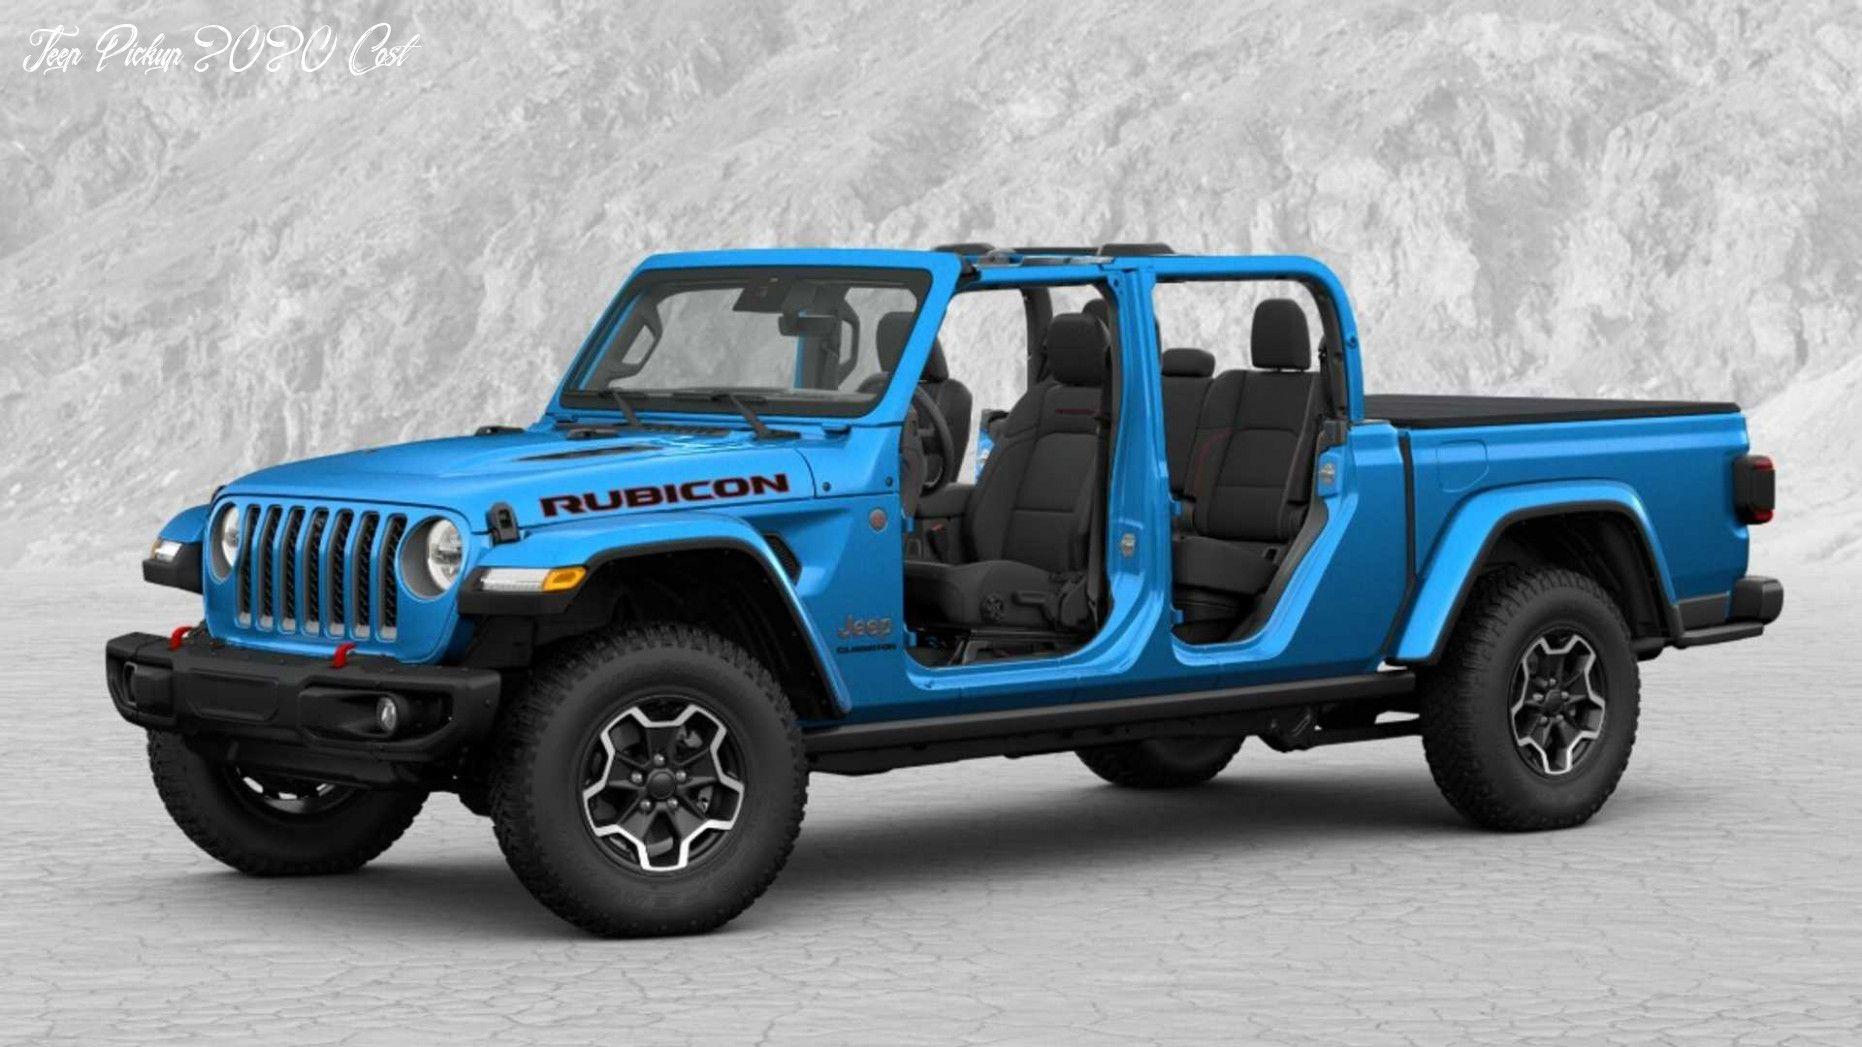 Jeep Pickup 2020 Cost Engine In 2020 Jeep Gladiator Jeep Pickup Truck New Jeep Truck